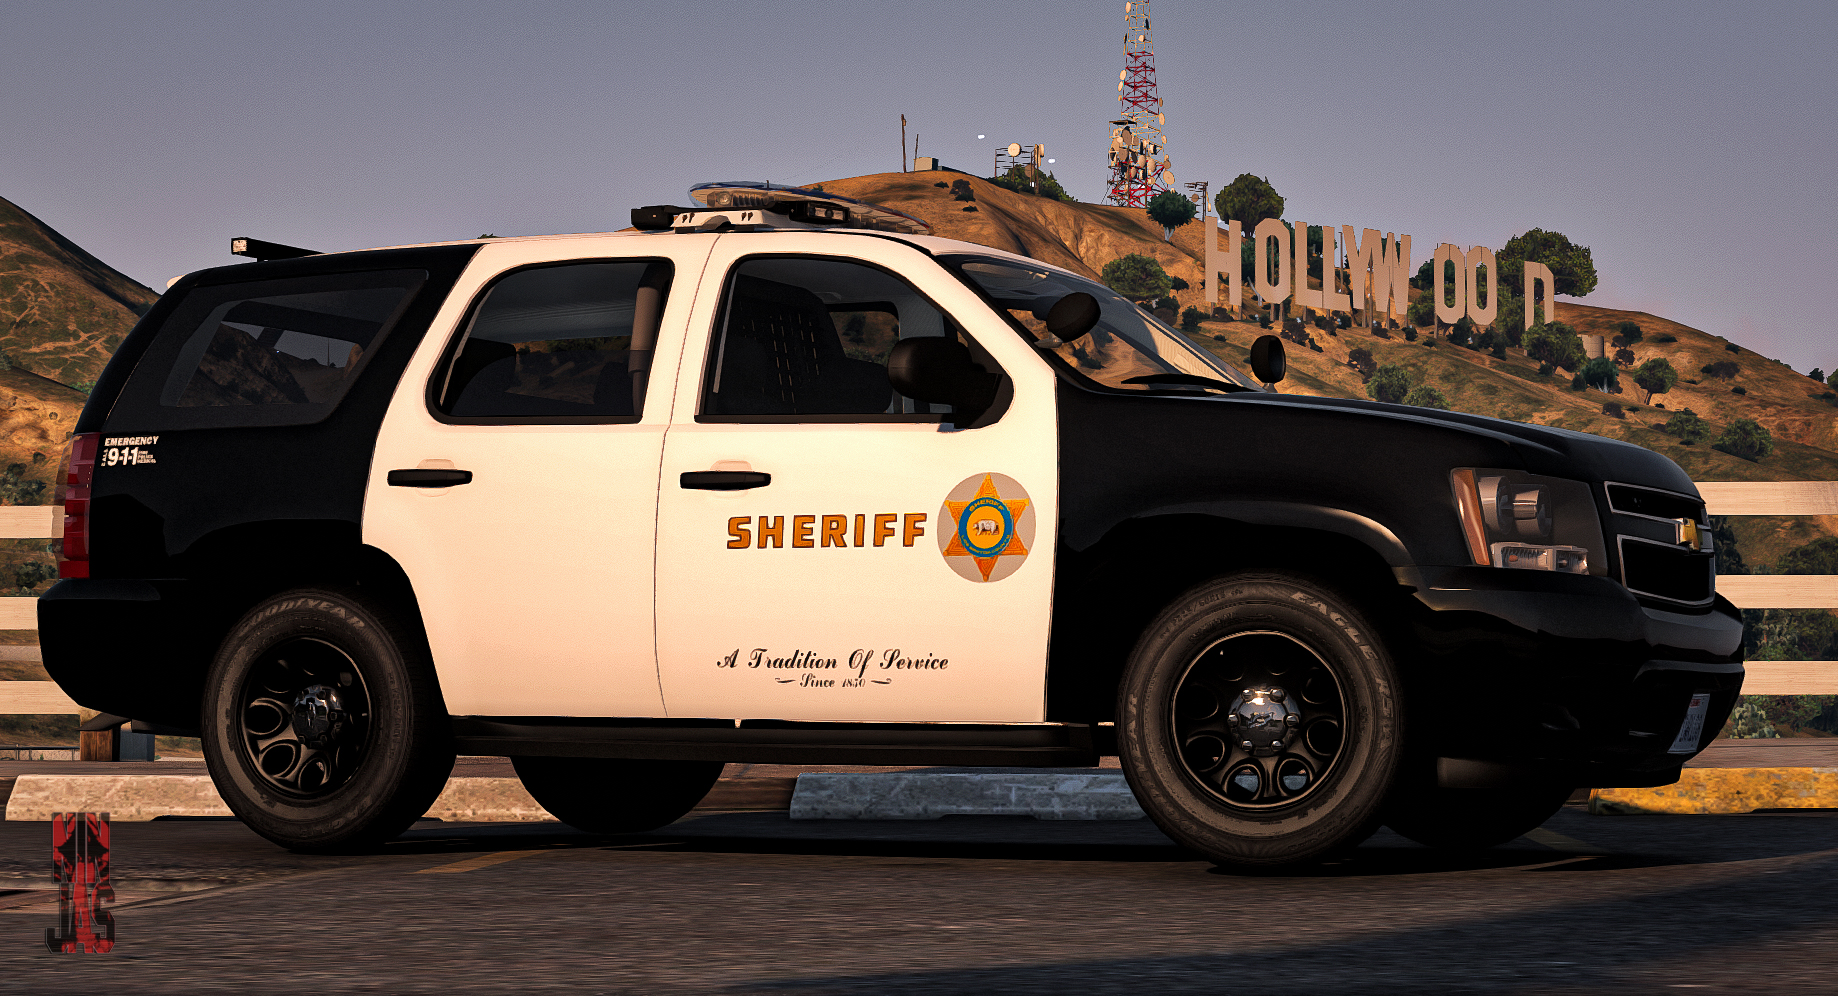 Grand_Theft_Auto_V_Screenshot_2021.06.11_-_21.04.46.54.png